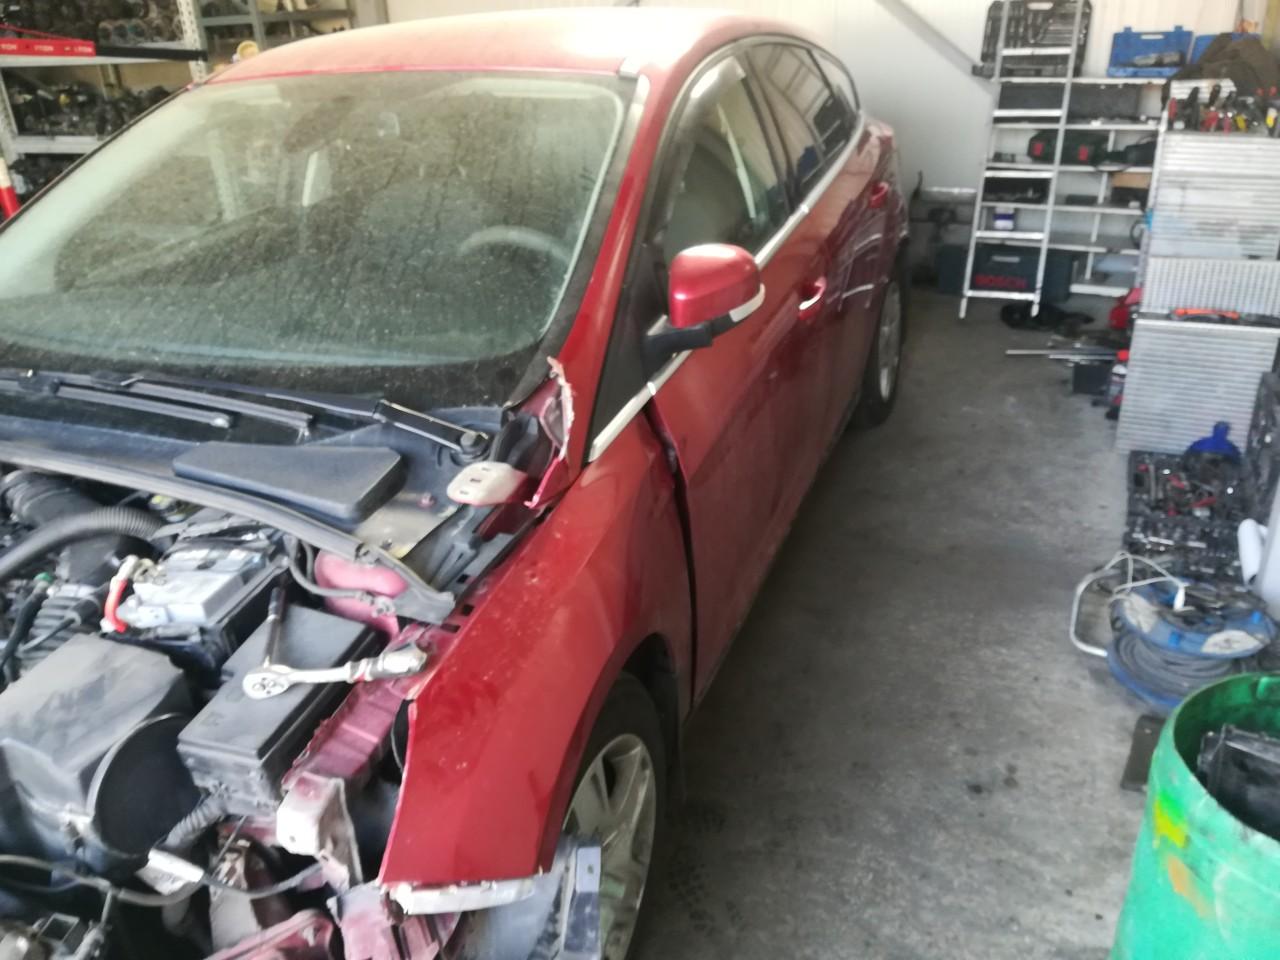 Dezmembrez Ford Focus 3 1.6 ecoobost 110kw motor JQDB din 2012